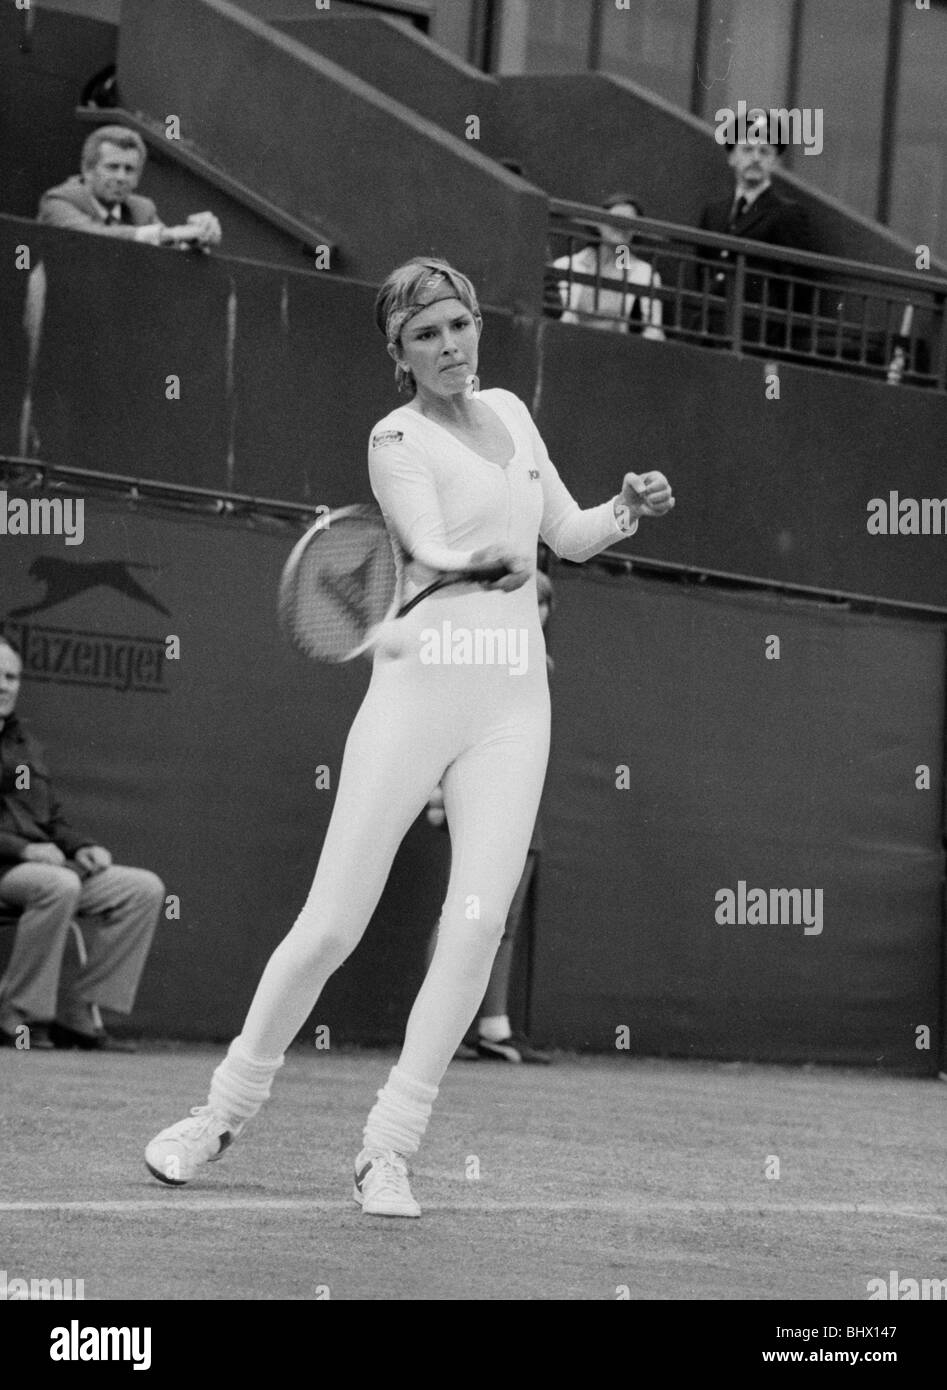 Singlar reser tennis